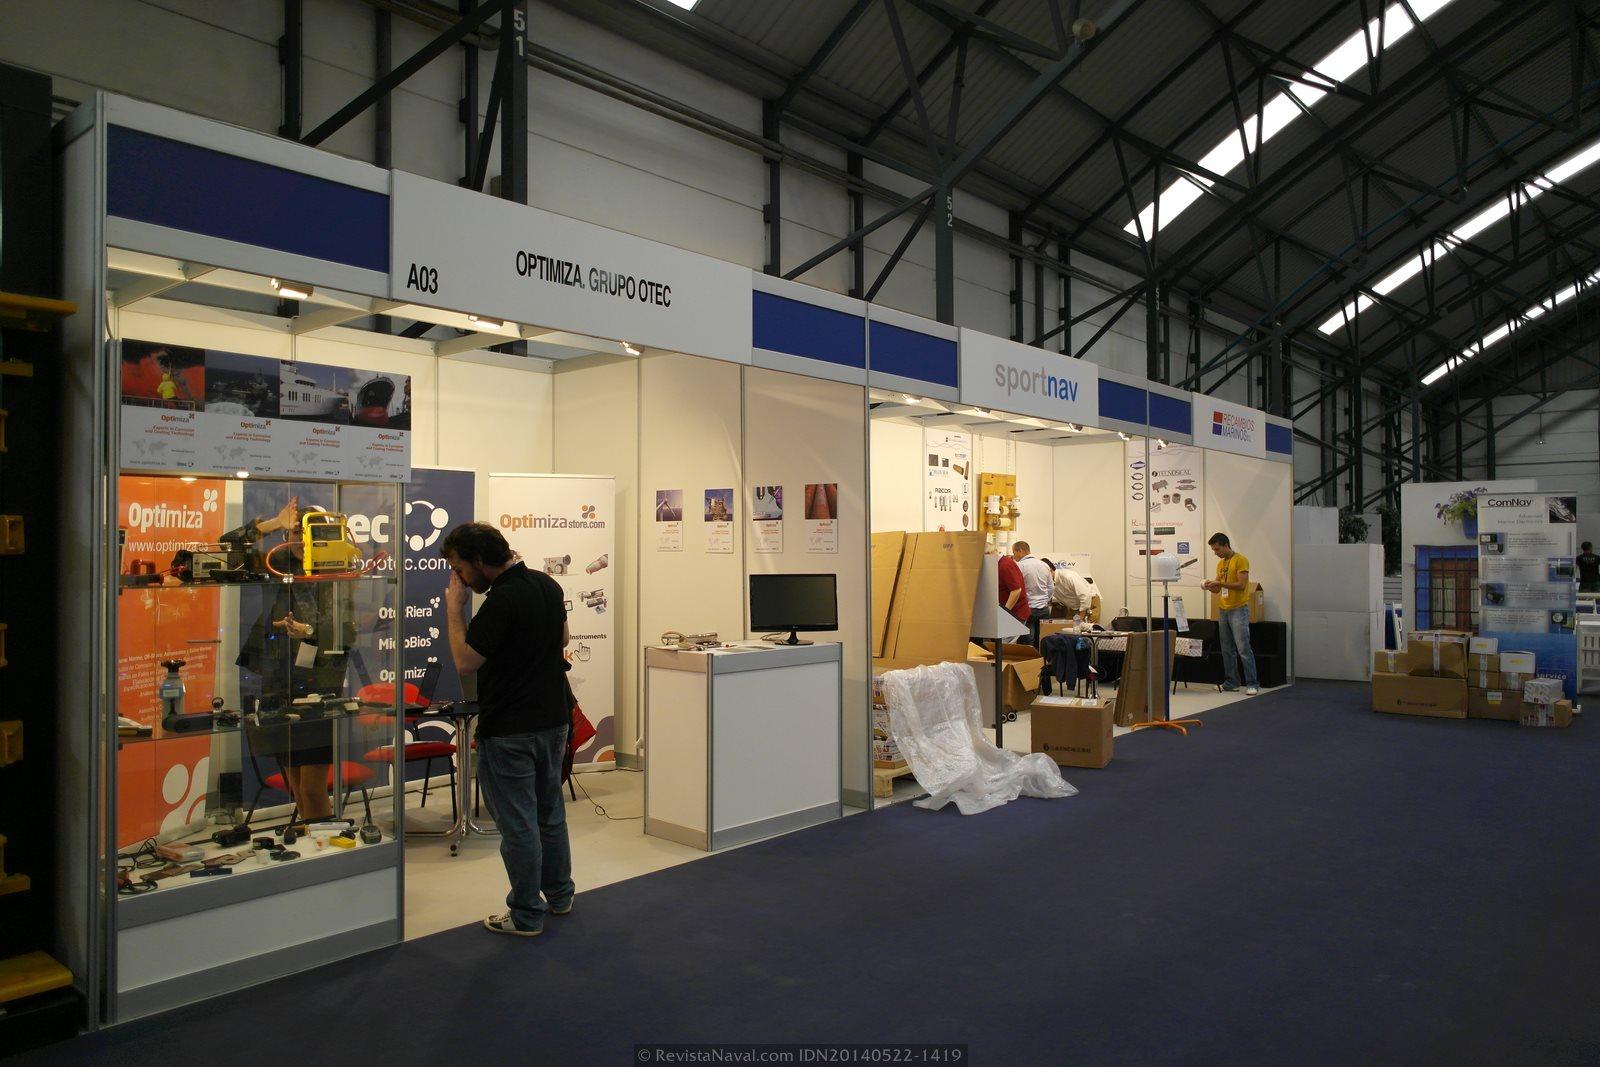 Estands de Optimiza-Grupo OTEc, SportNav y Recambios Marinos SL (Foto: Revista Naval)